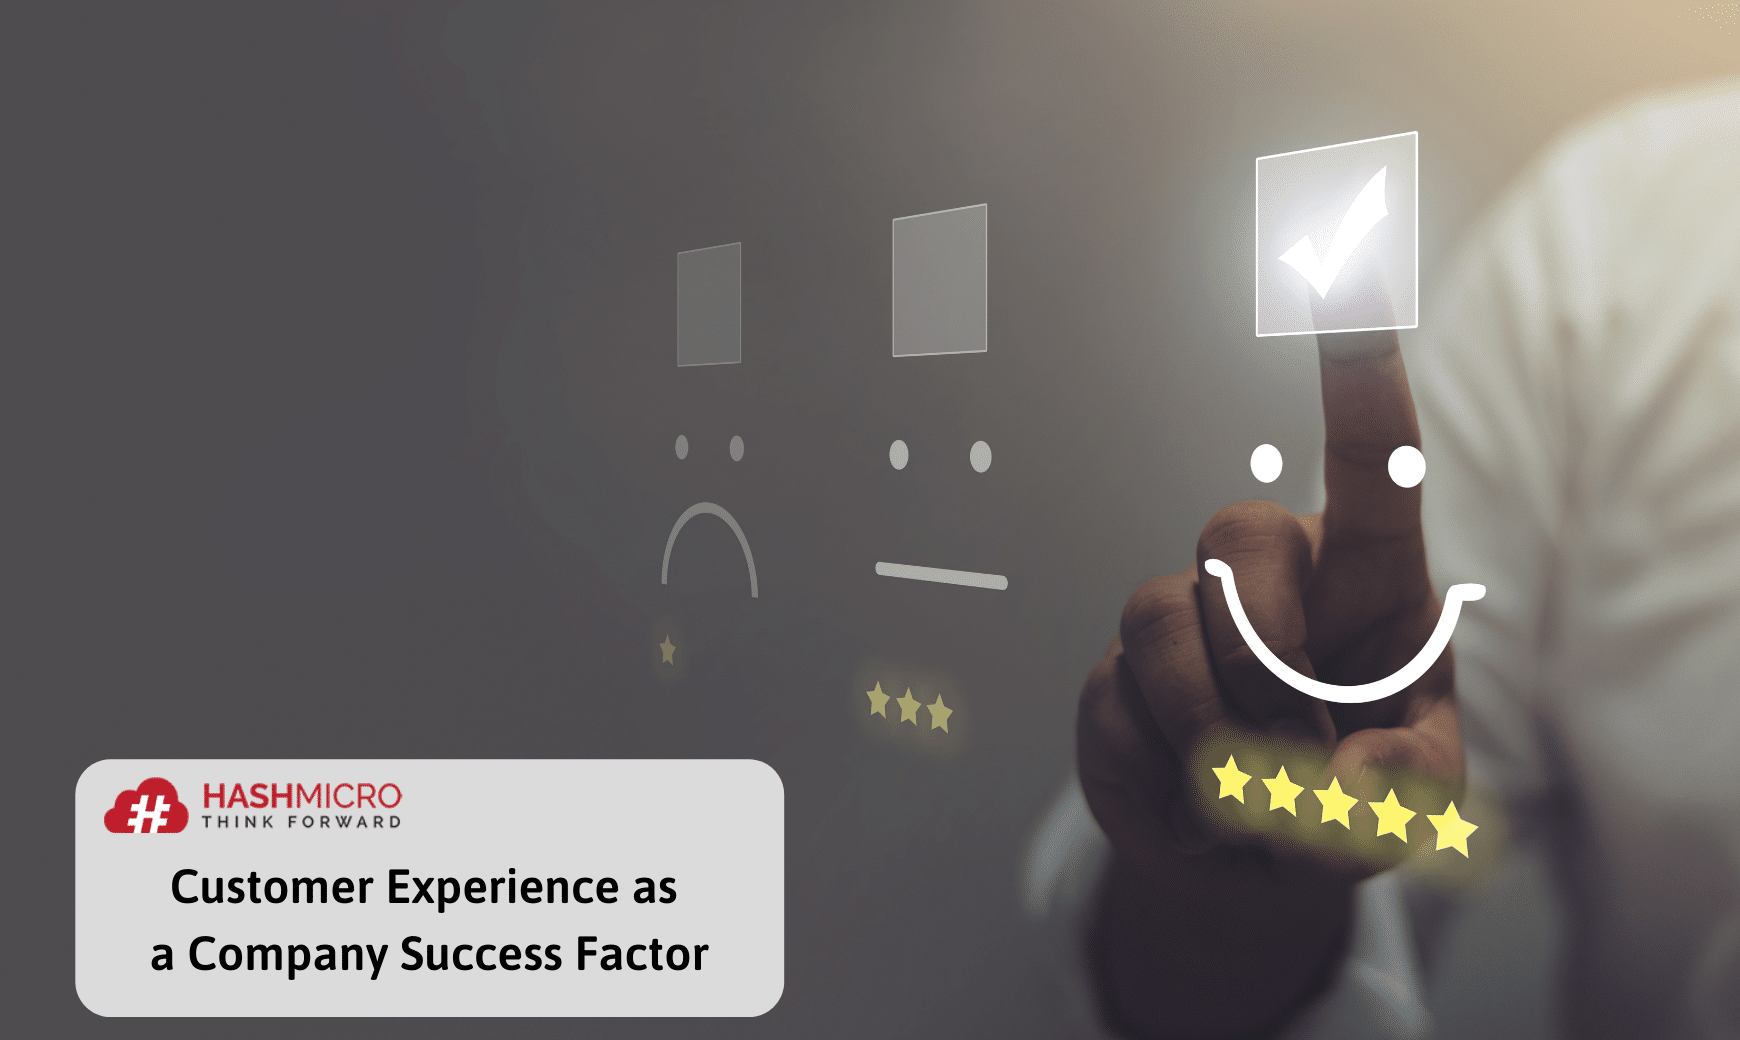 Customer Experience as a Company Success Factor